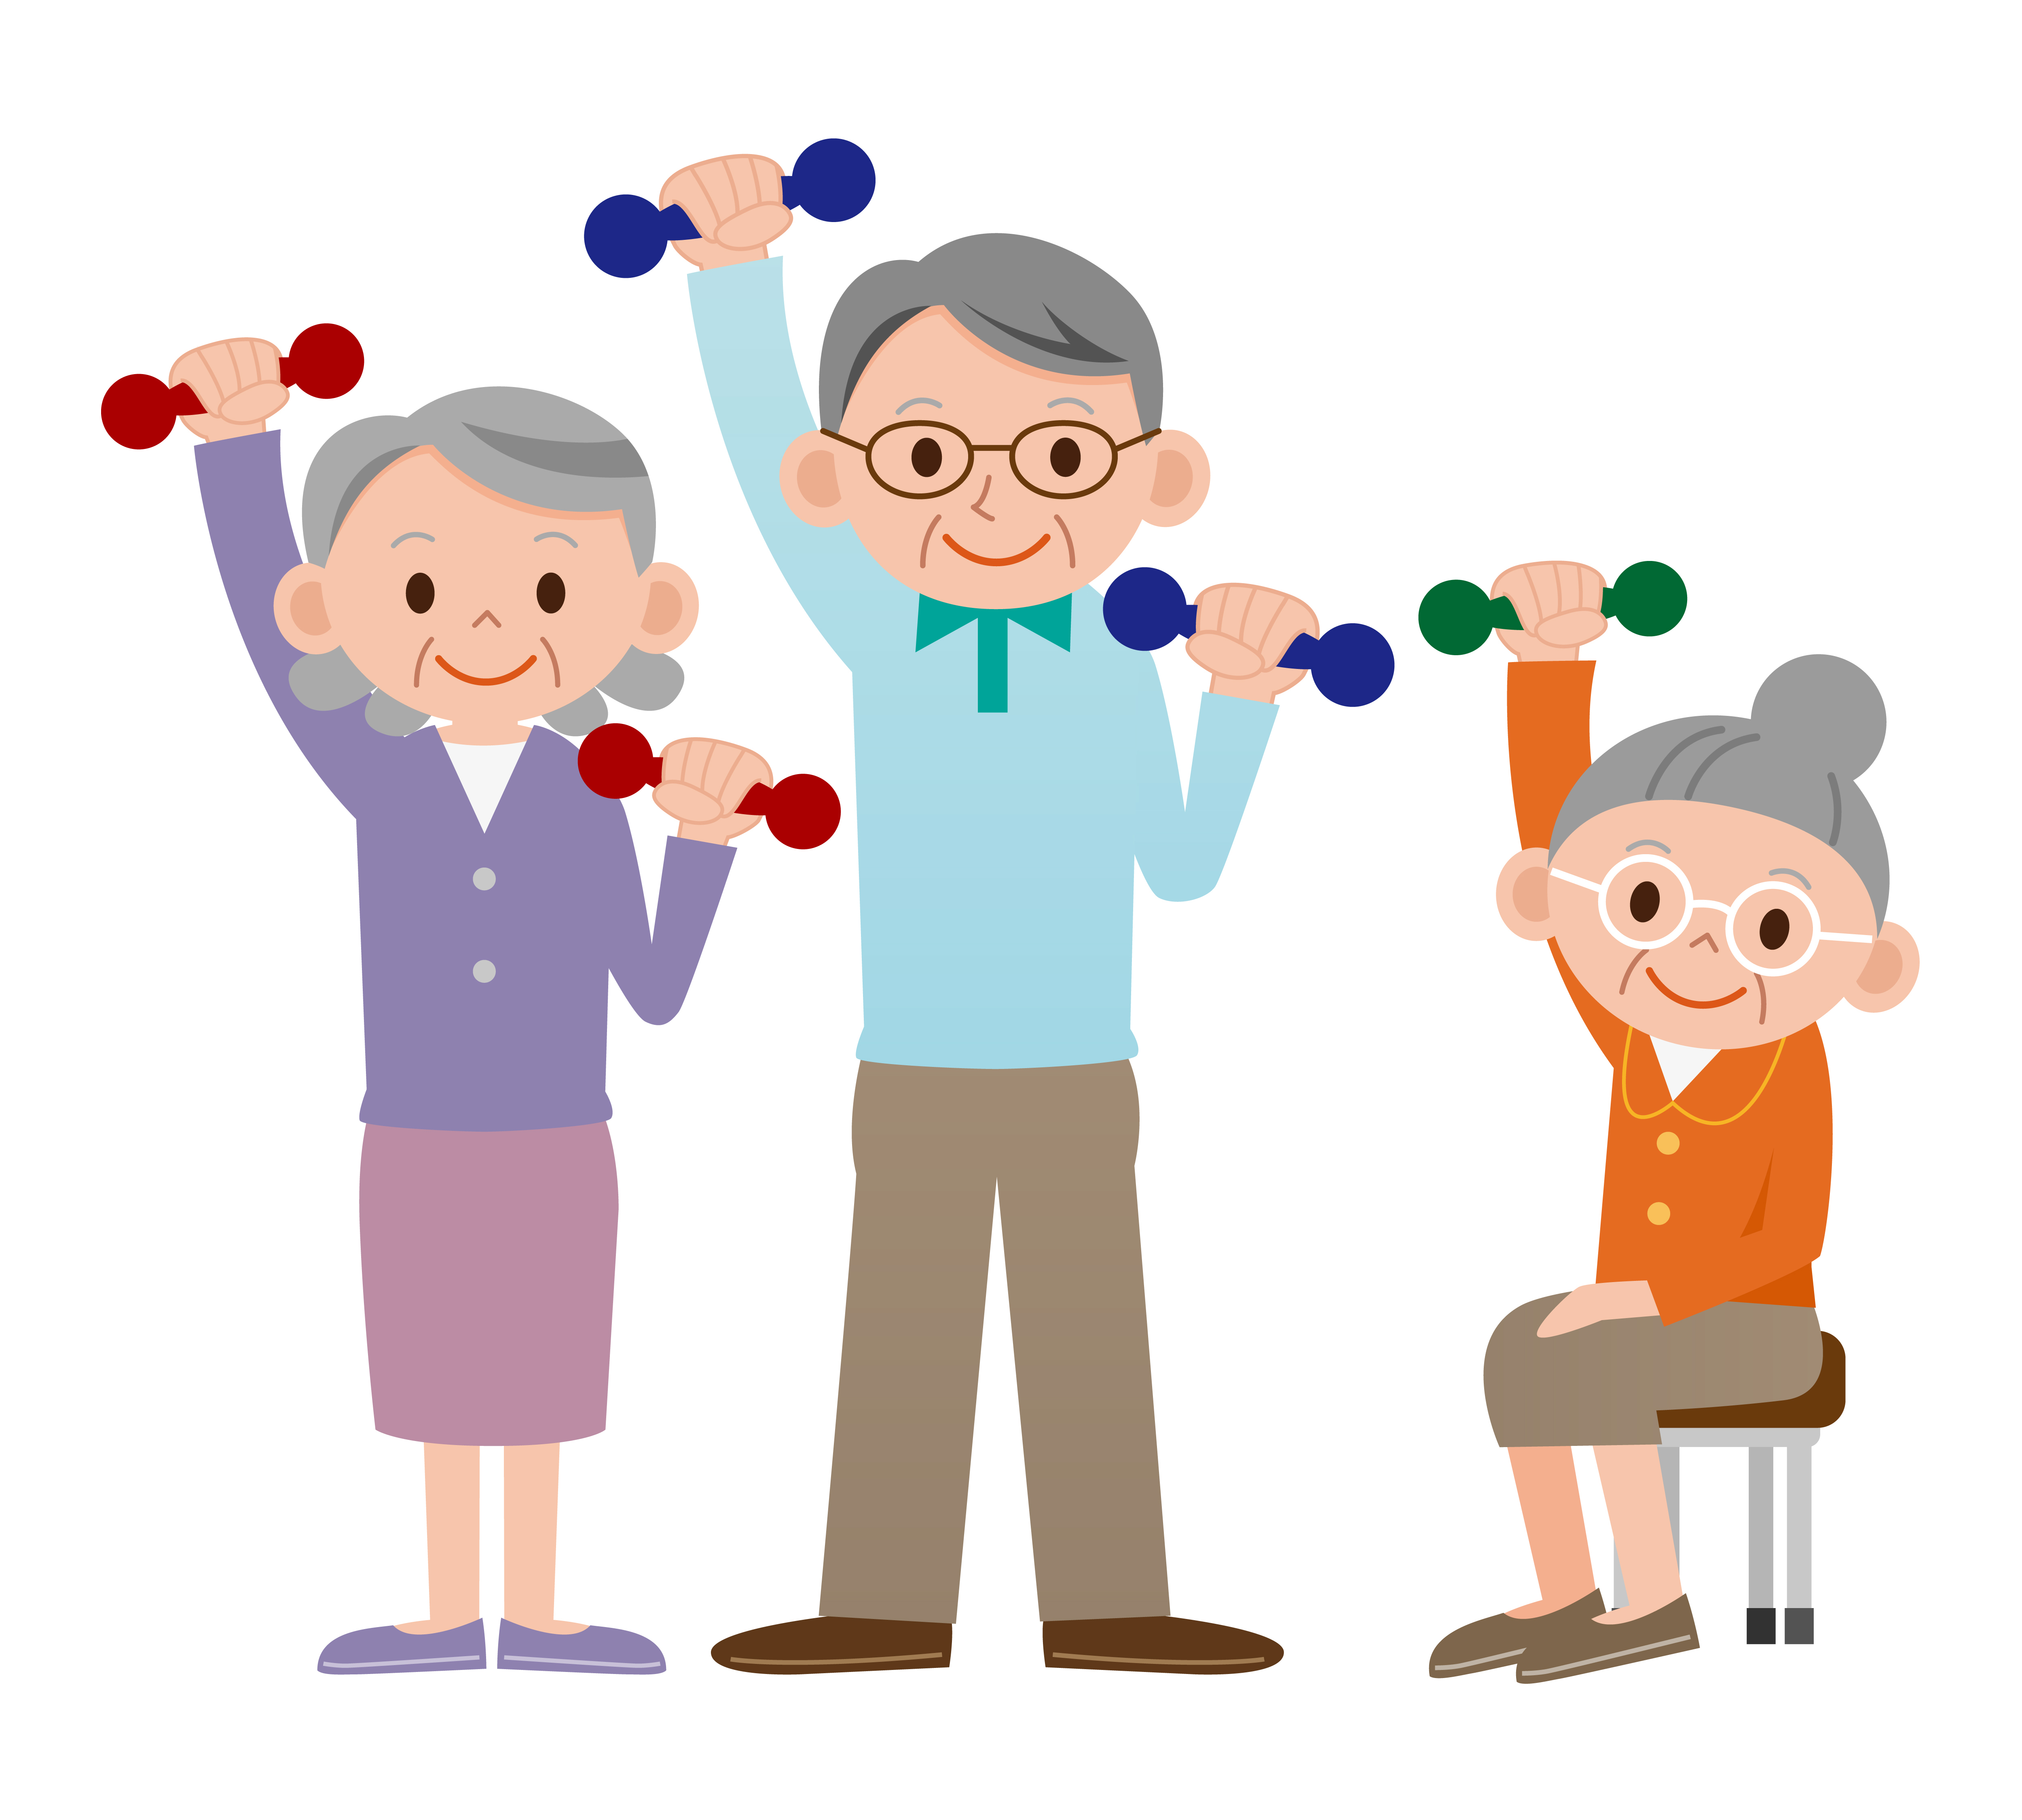 Exercising clipart elderly transparent.